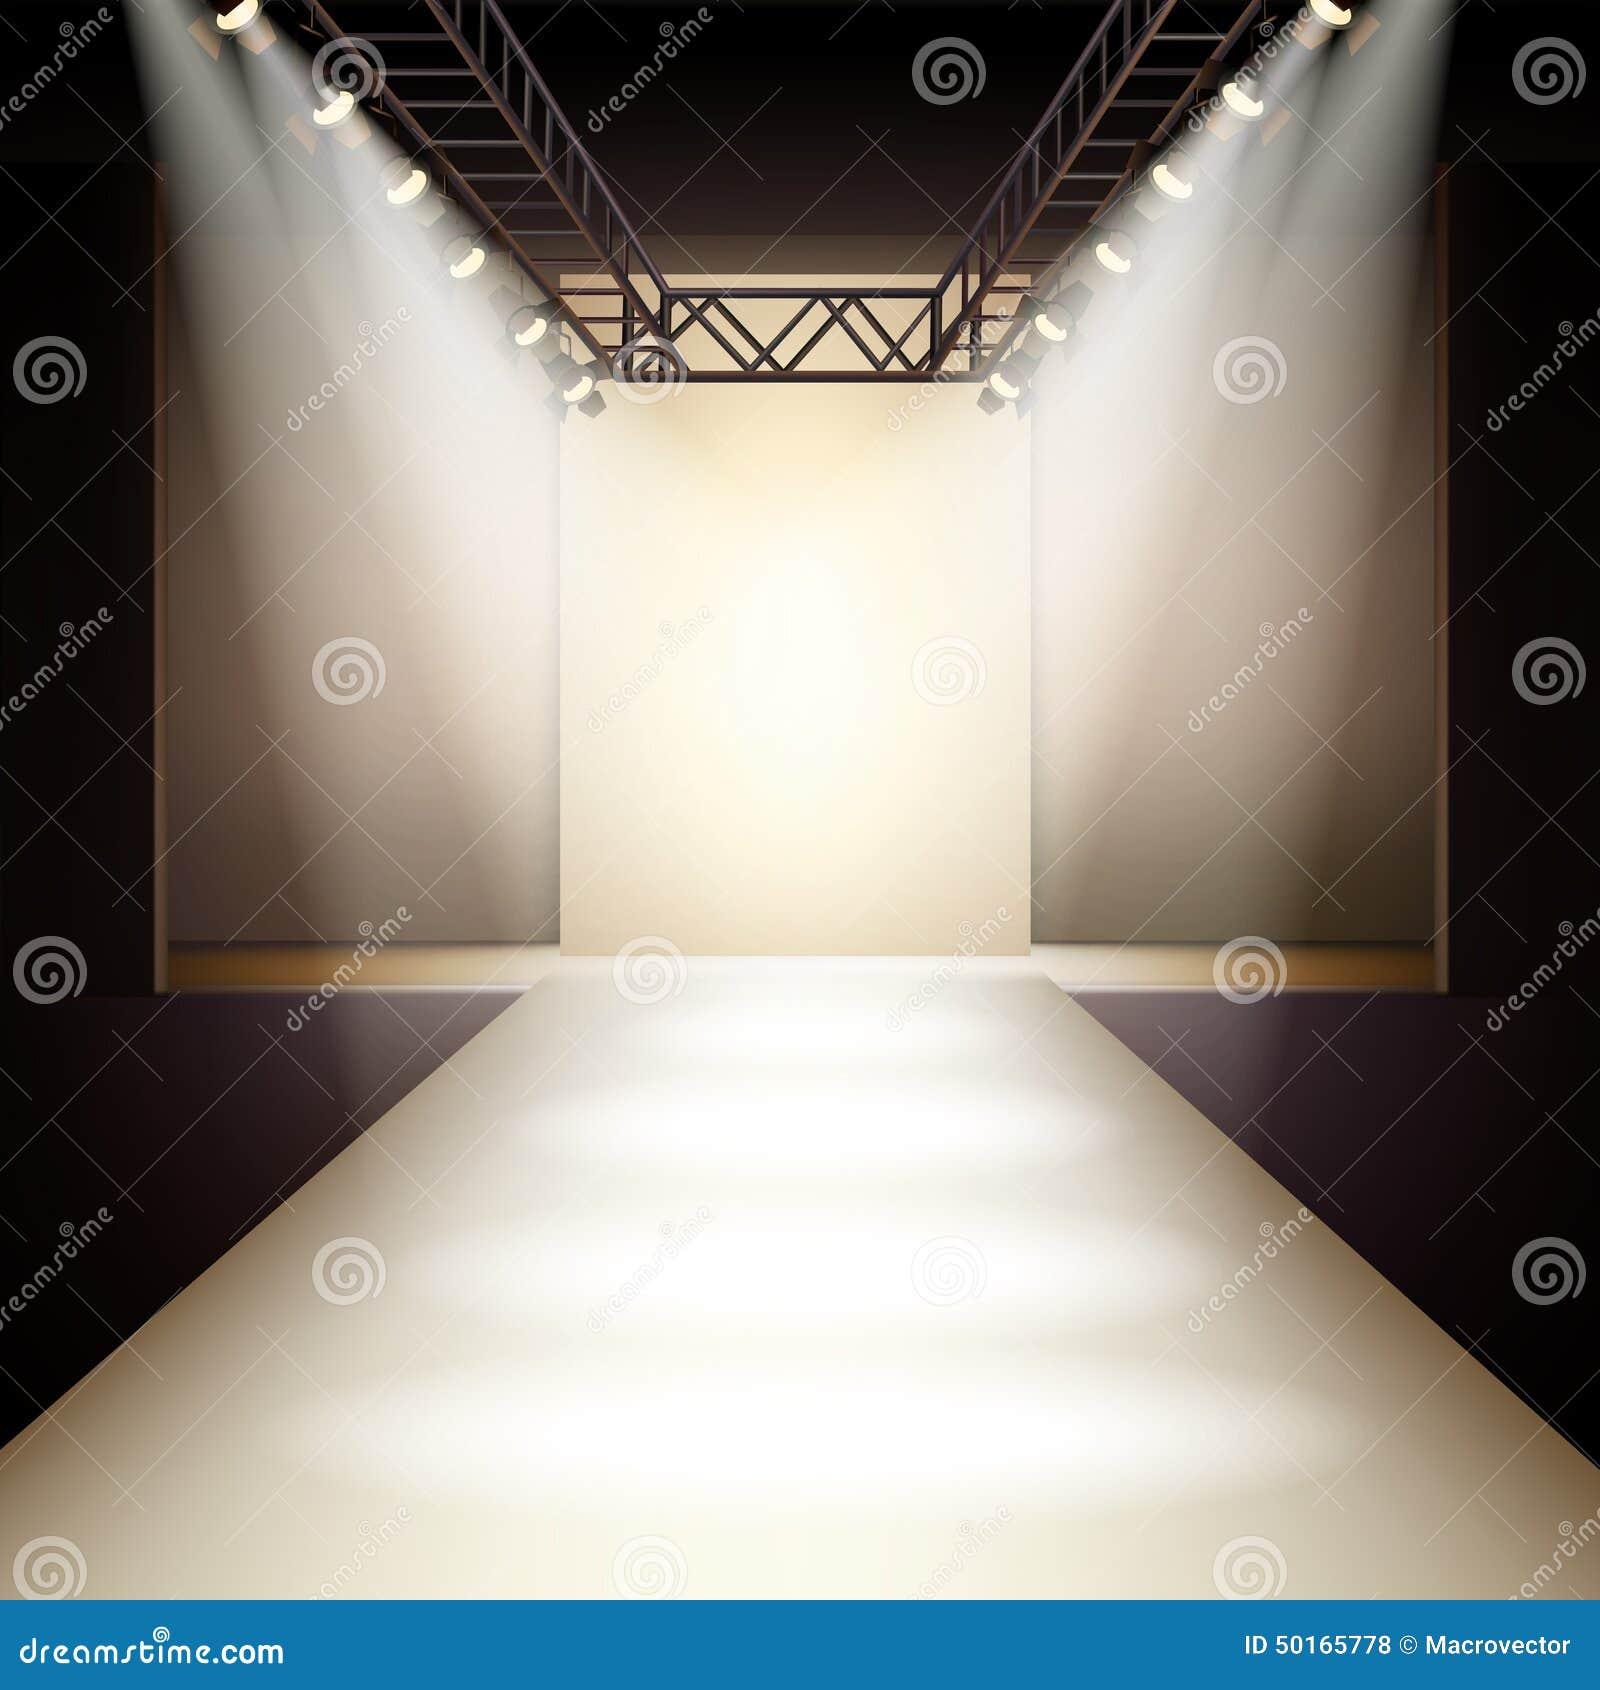 Empty fashion runway background